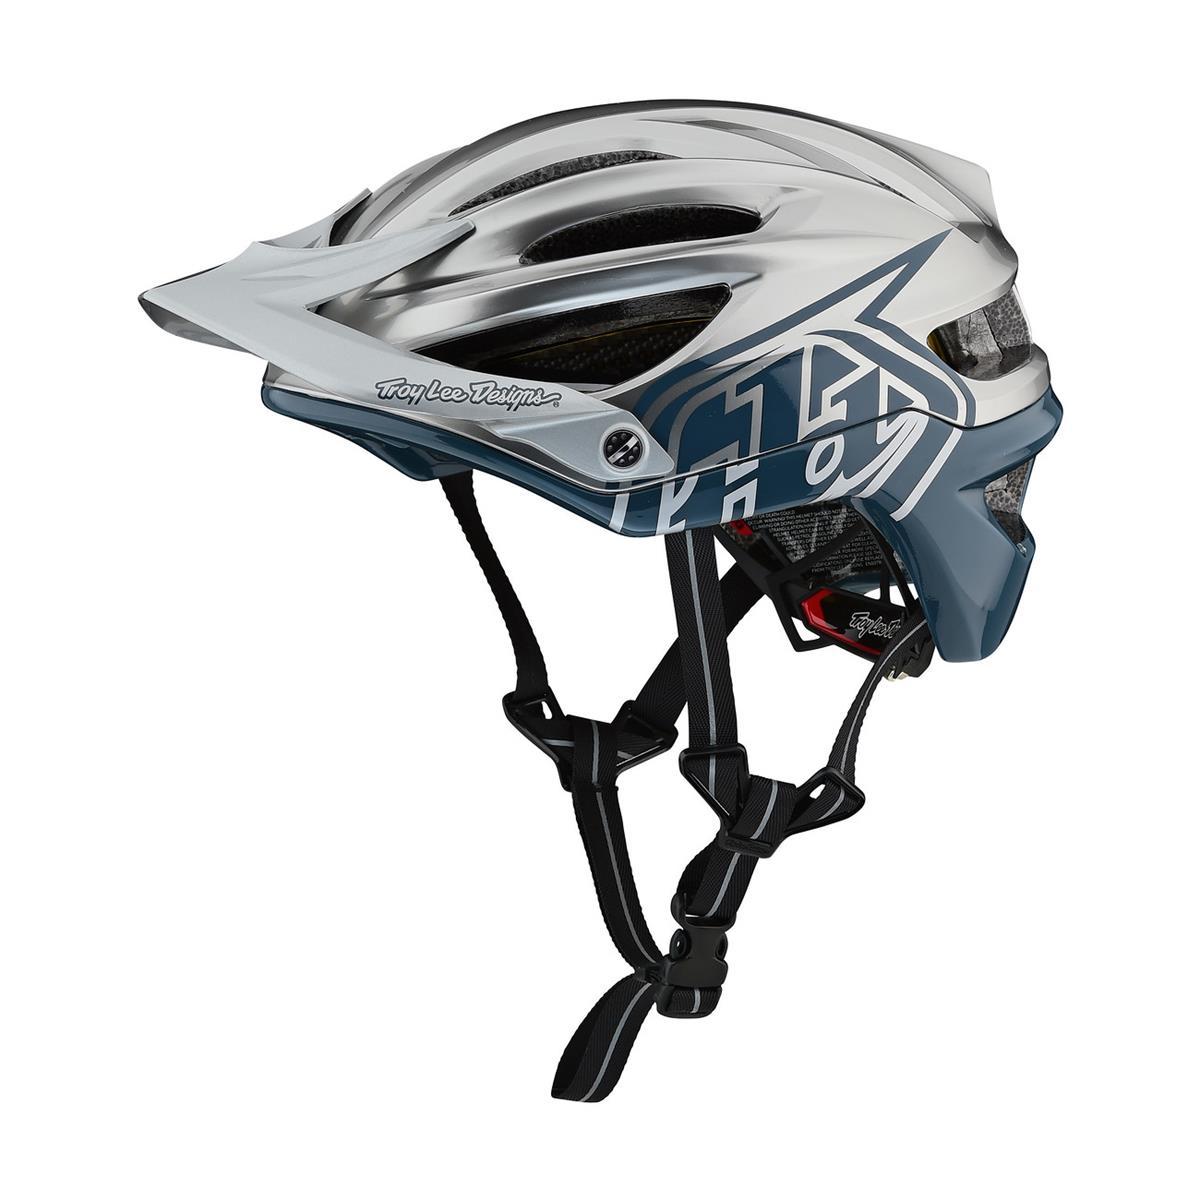 Troy Lee Designs Enduro-MTB Helm A2 MIPS Decoy - Air Force Blau/Silber